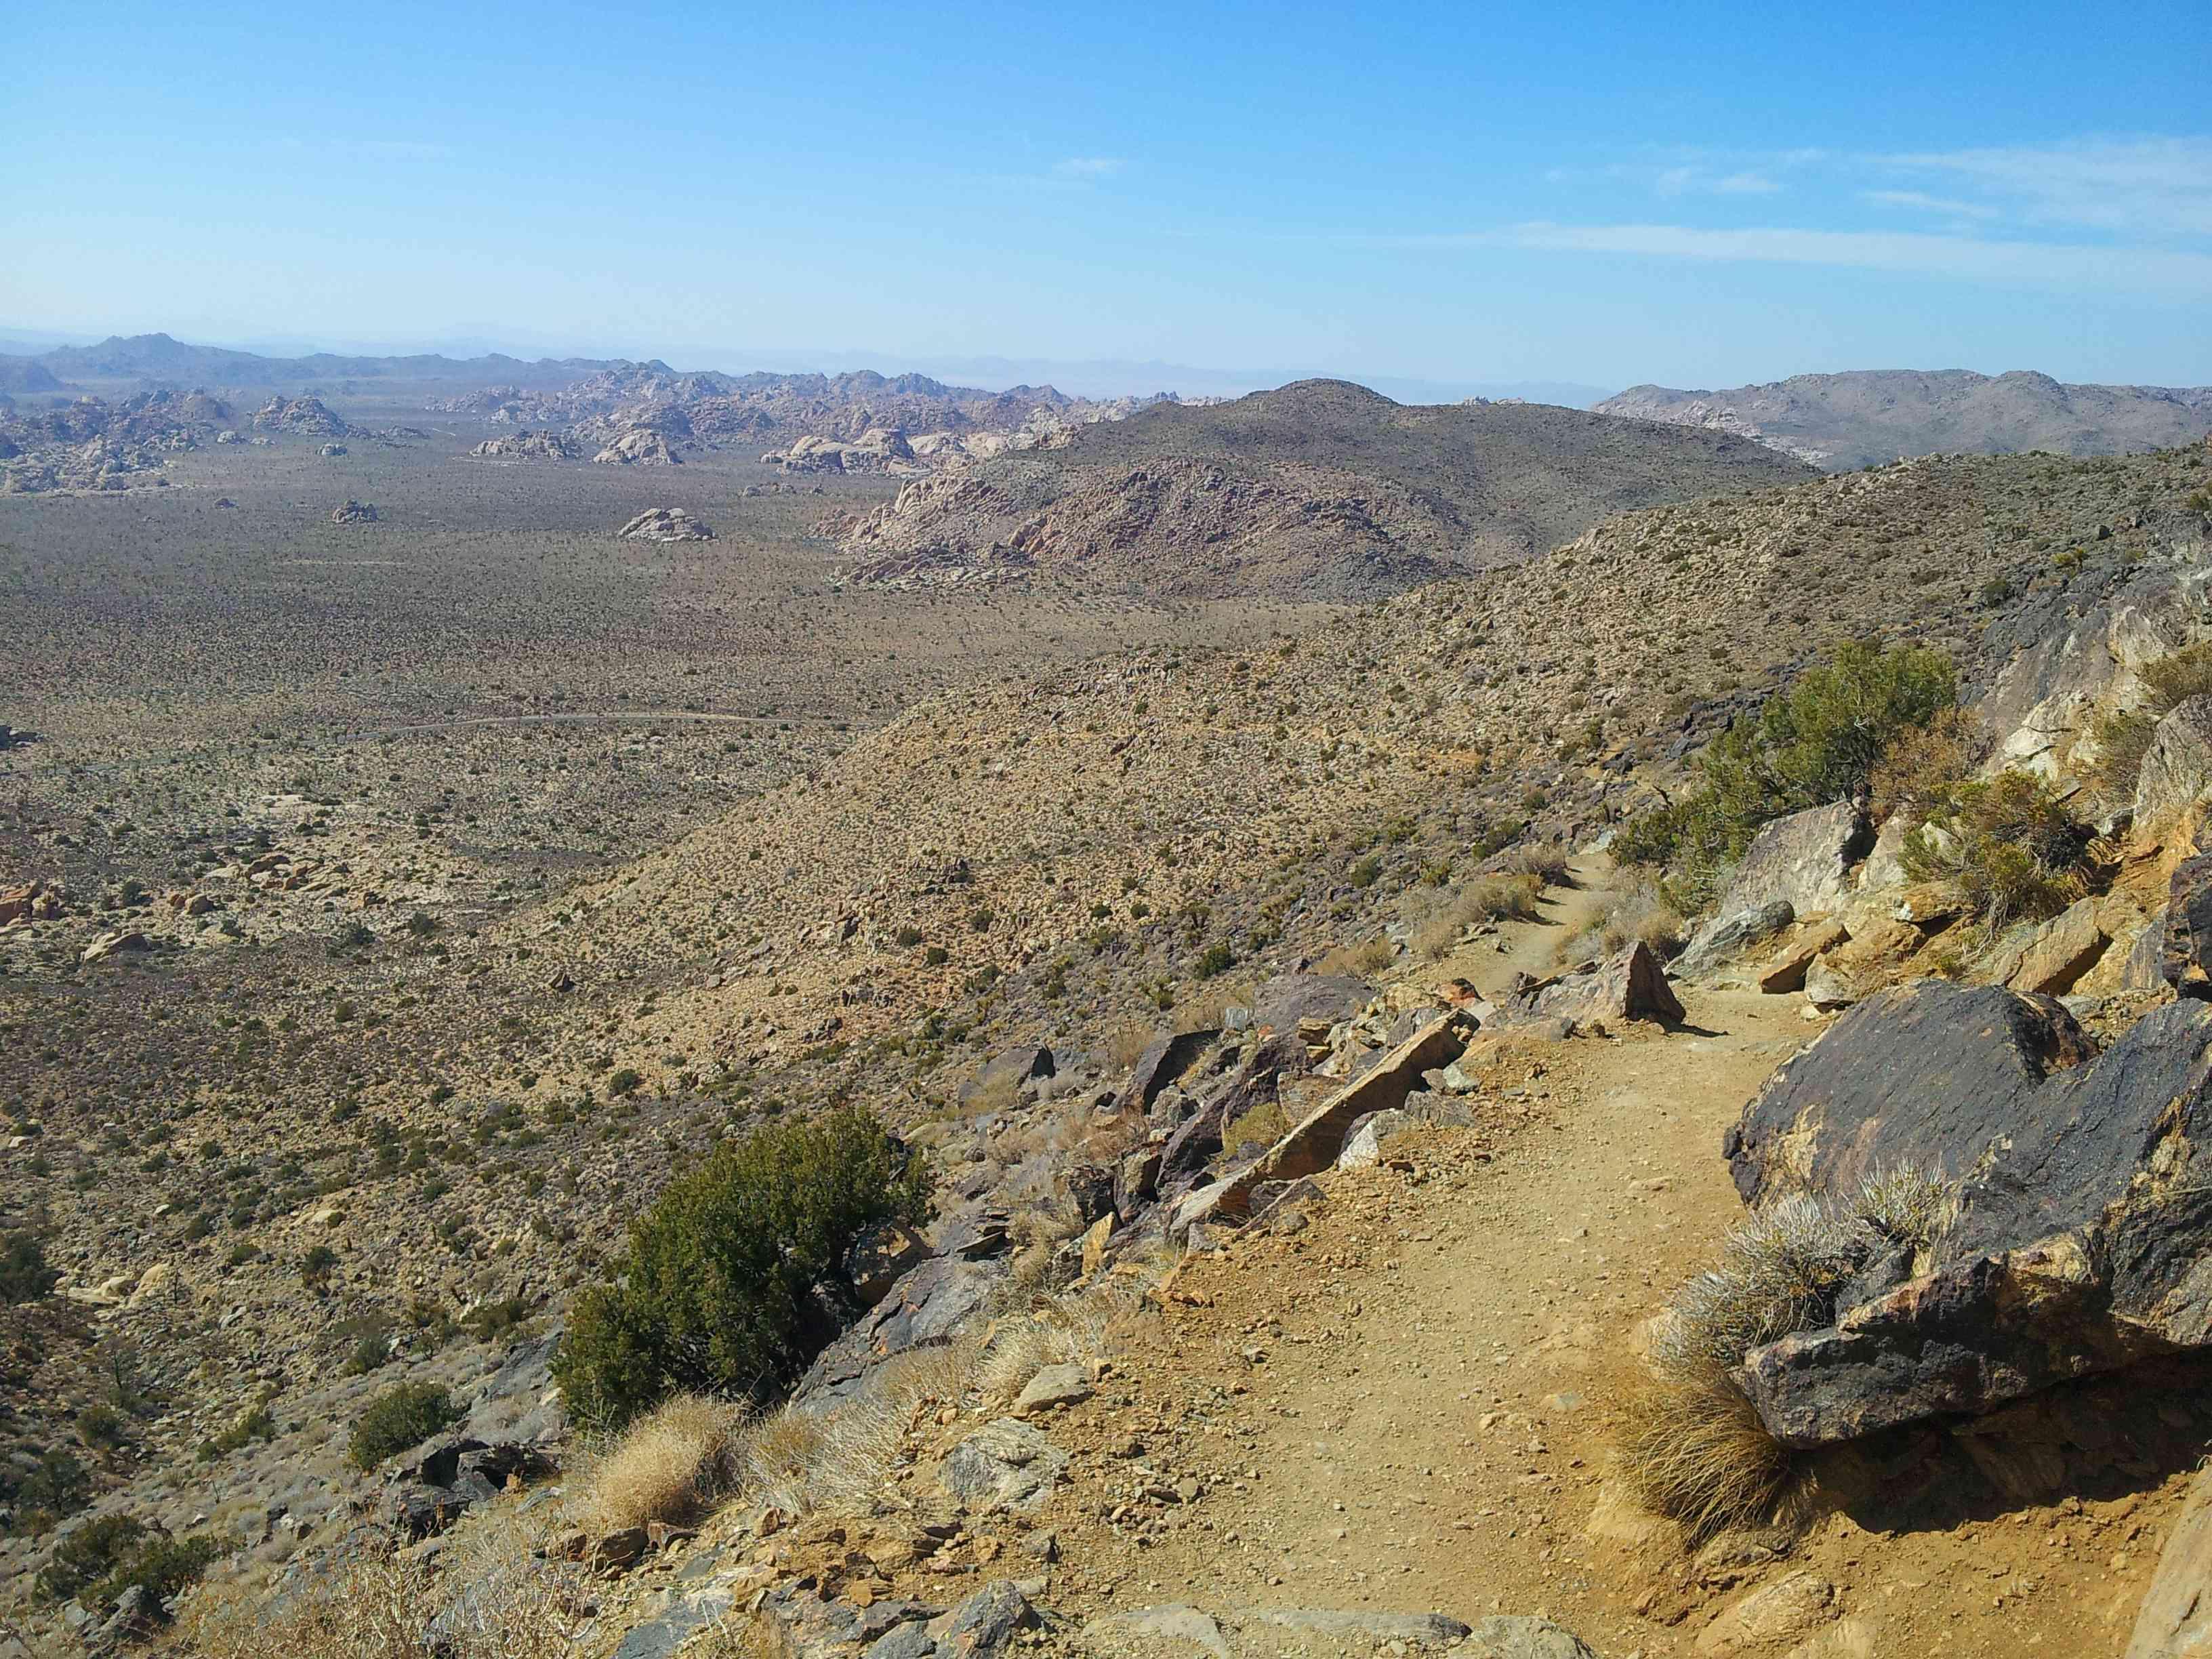 Ryan Mountain Hiking trail at Joshua Tree National Park